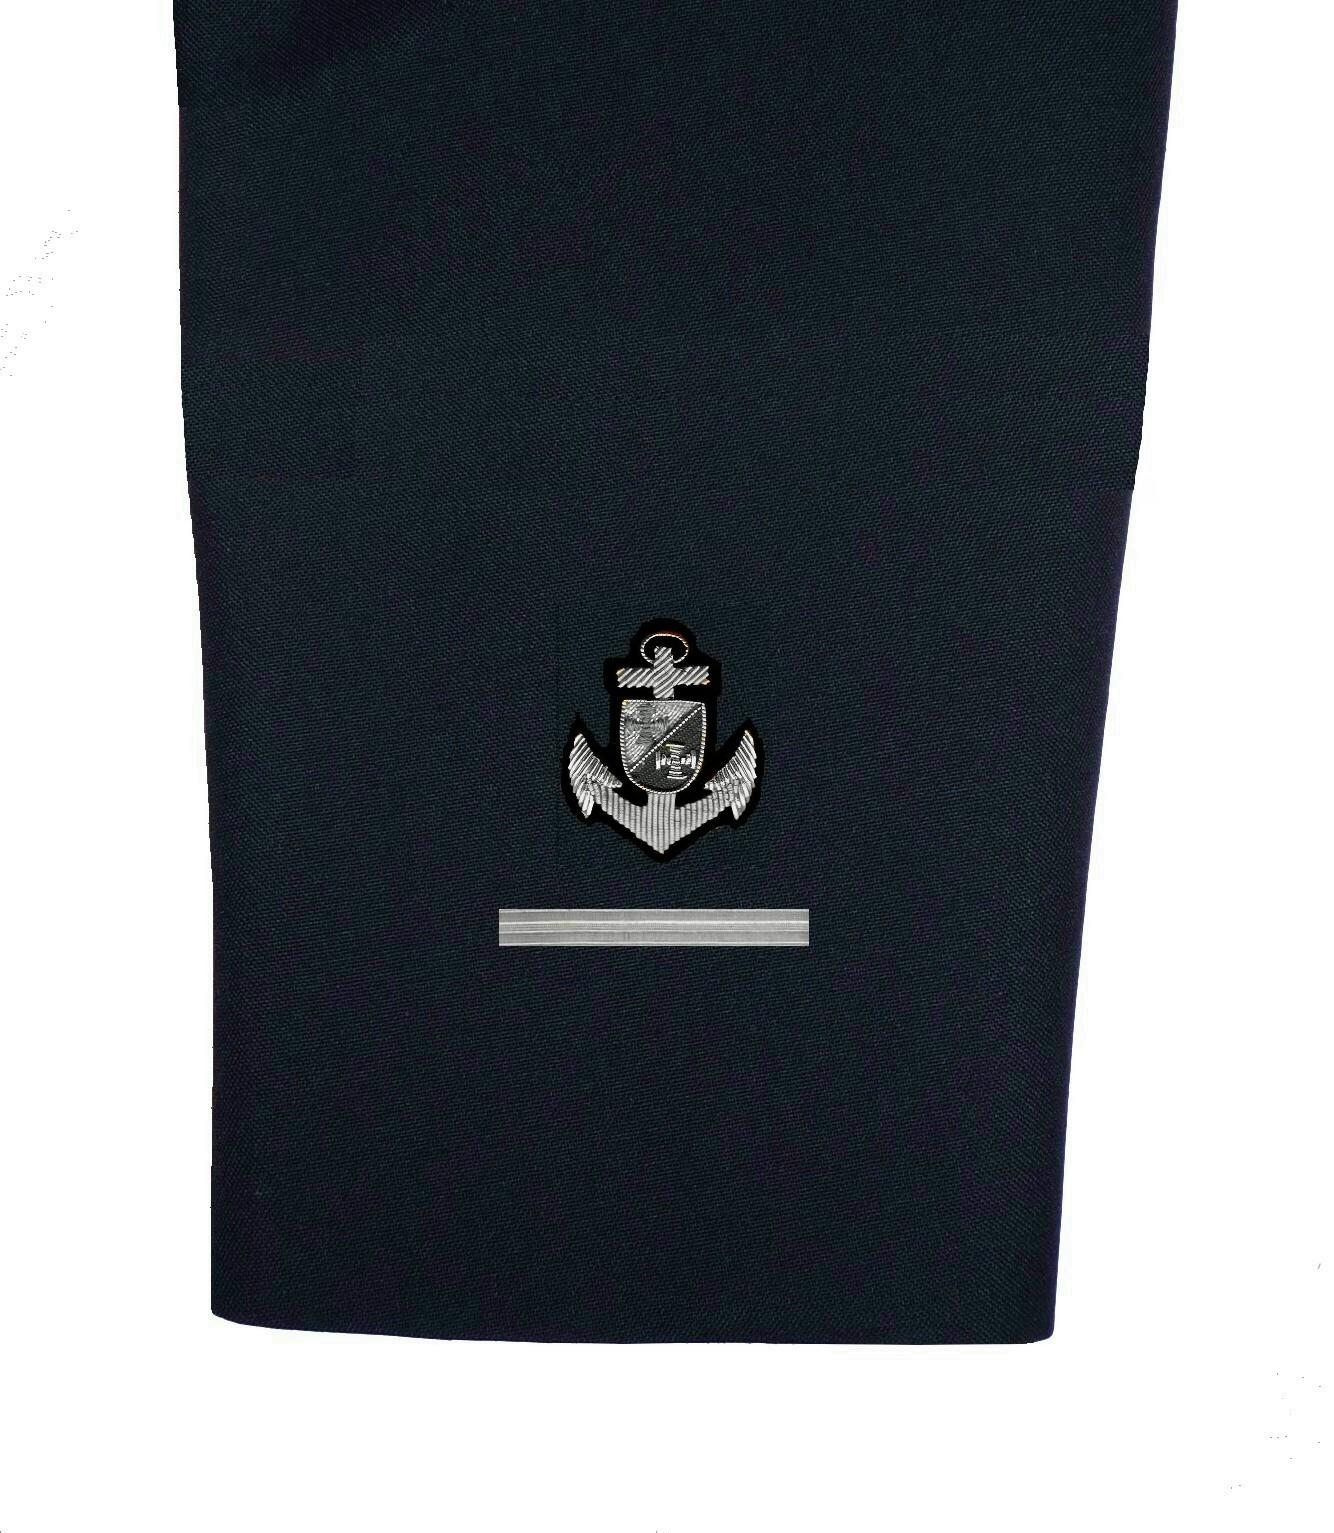 02-aermel-seaman-1st-class